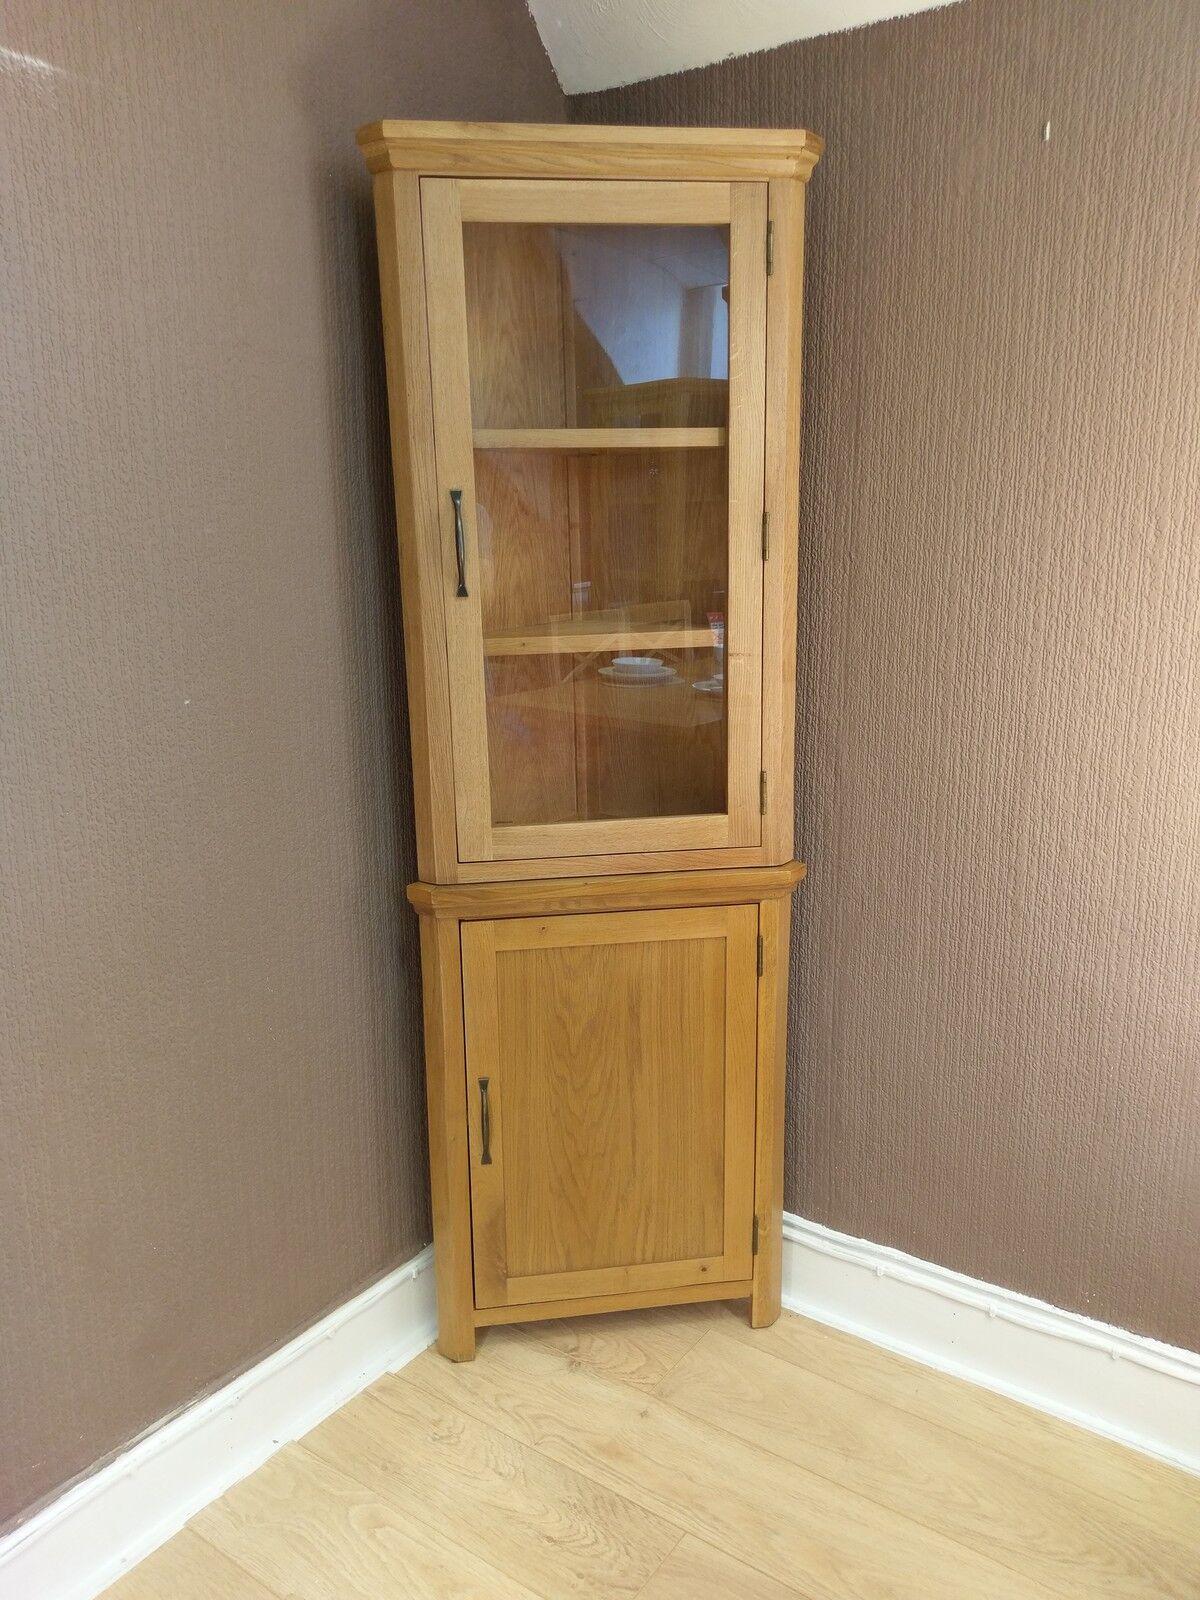 title | Tall Corner Kitchen Cabinet